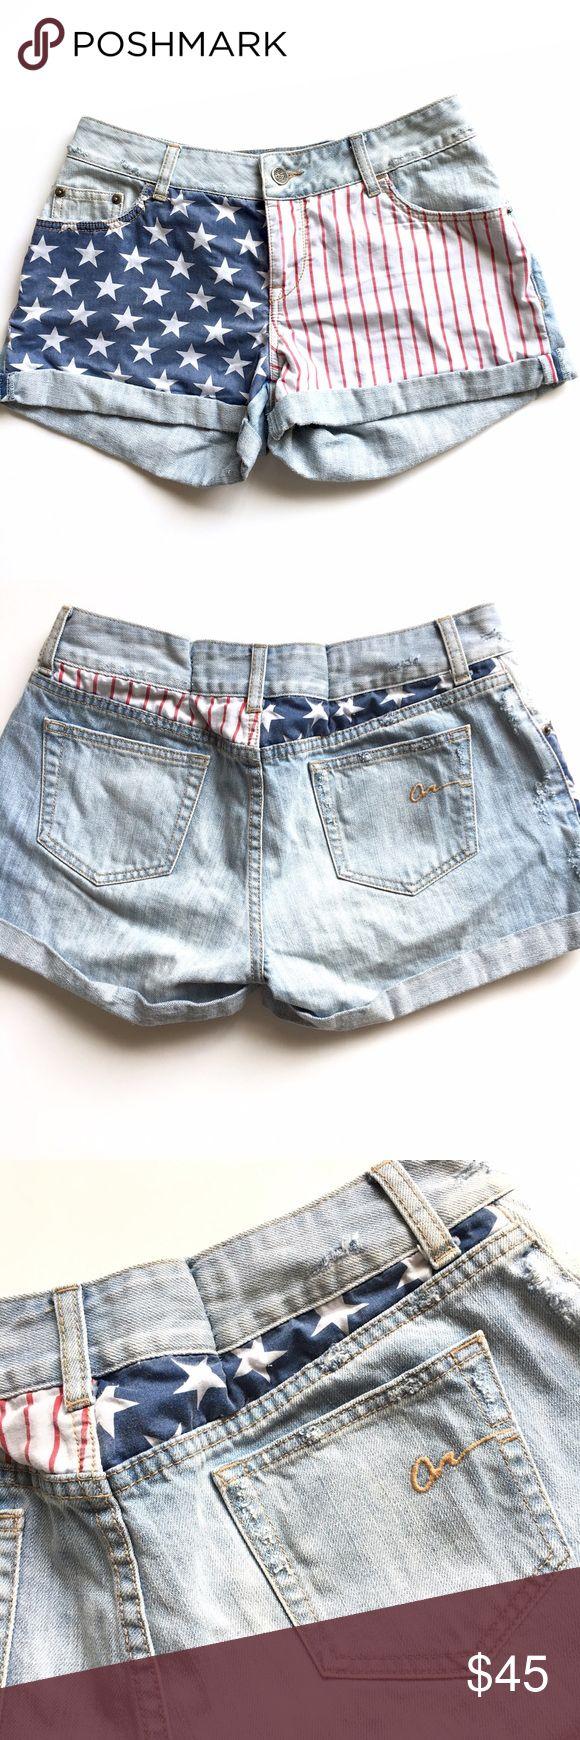 "American Cie Rag American Flag Denim Shorts Sz 9 Light wash Denim Shorts with American flag detailing in front. Size 9. Outseam length 11"" American Rag Shorts Jean Shorts"